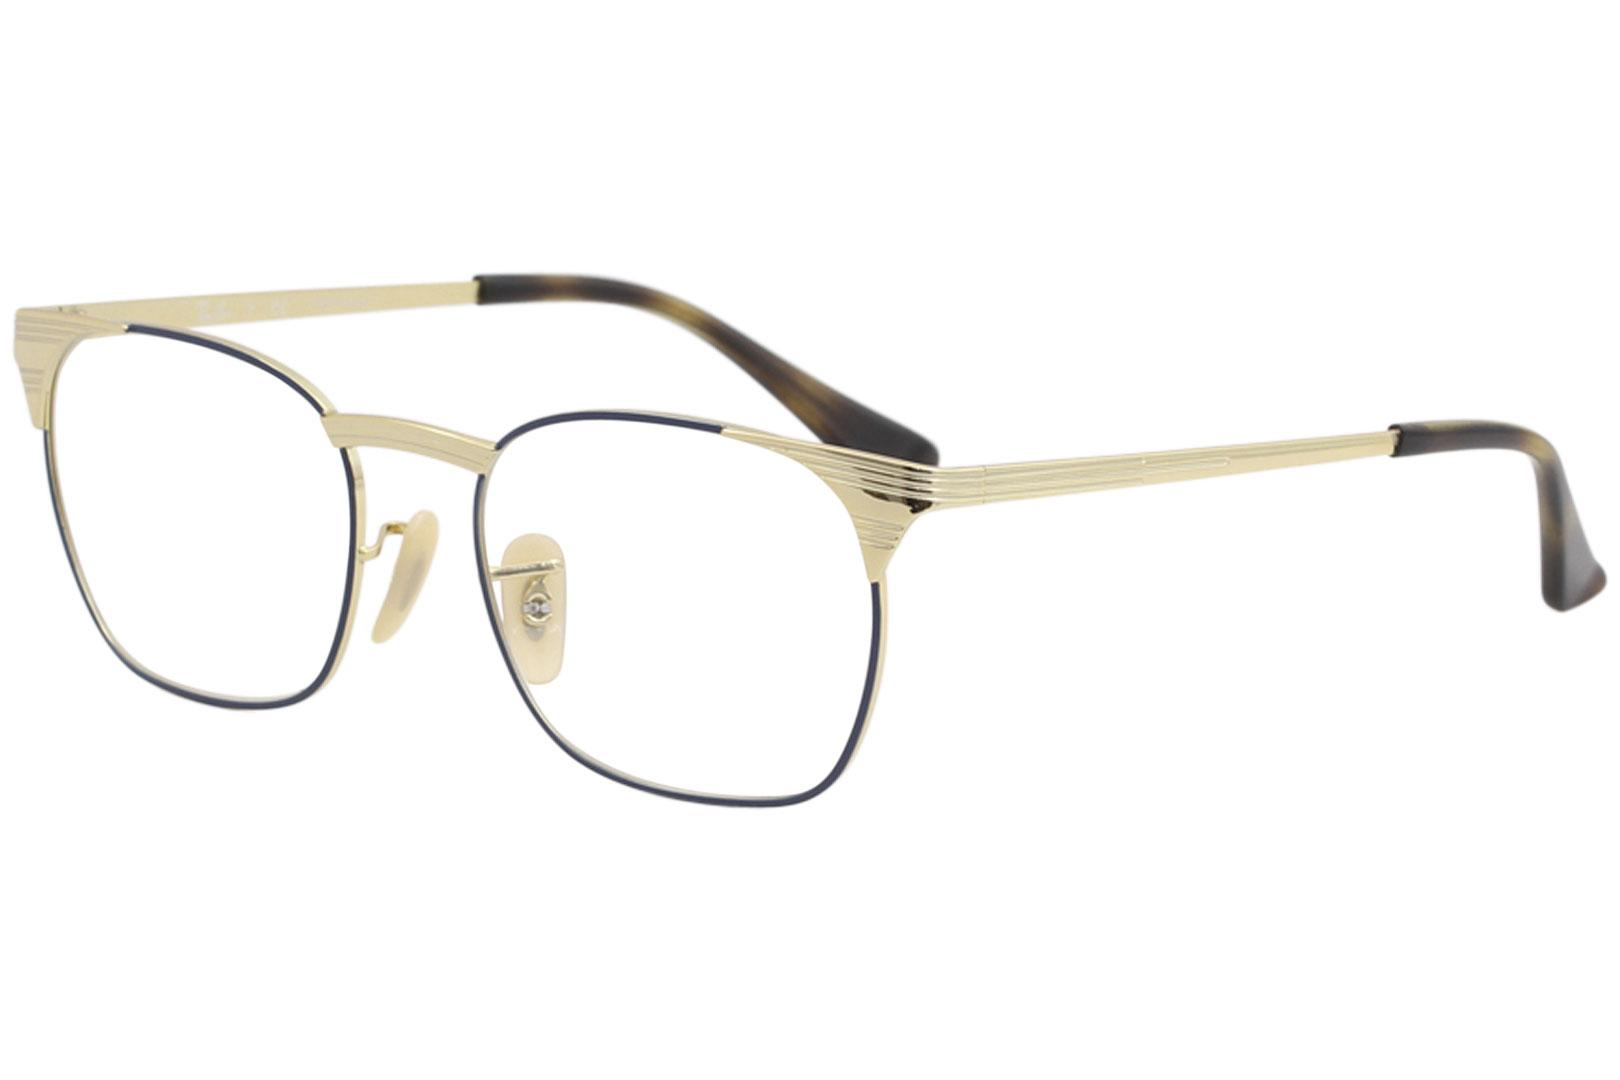 6962a9042fc9 Ray Ban Eyeglasses RX6386 RB 6386 RayBan 2903 Gold Top Blue Optical ...